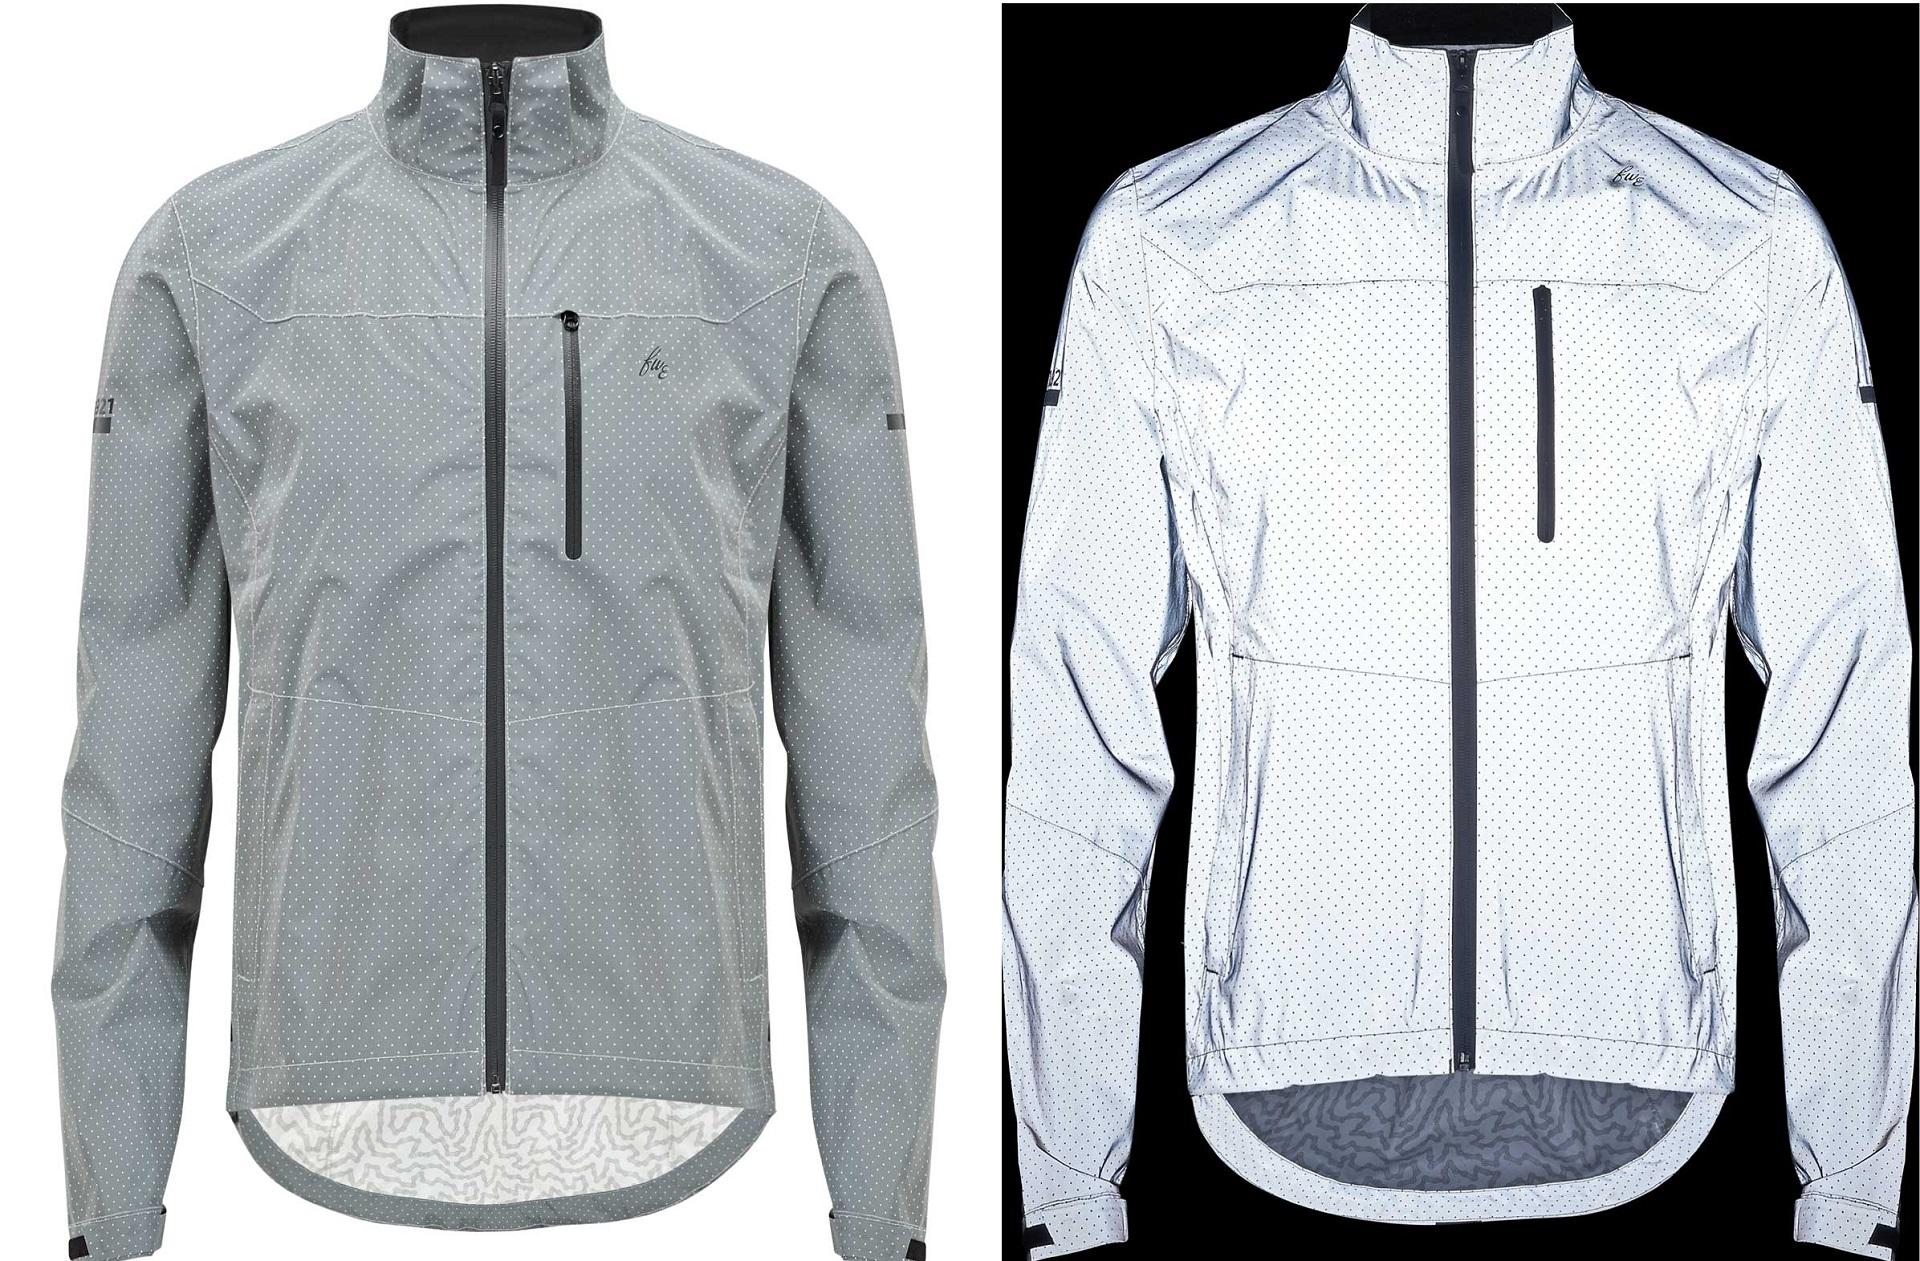 Men/'s Cycling Jackets High Visibility Reflective Hi Viz Bike Jerseys Windbreaker